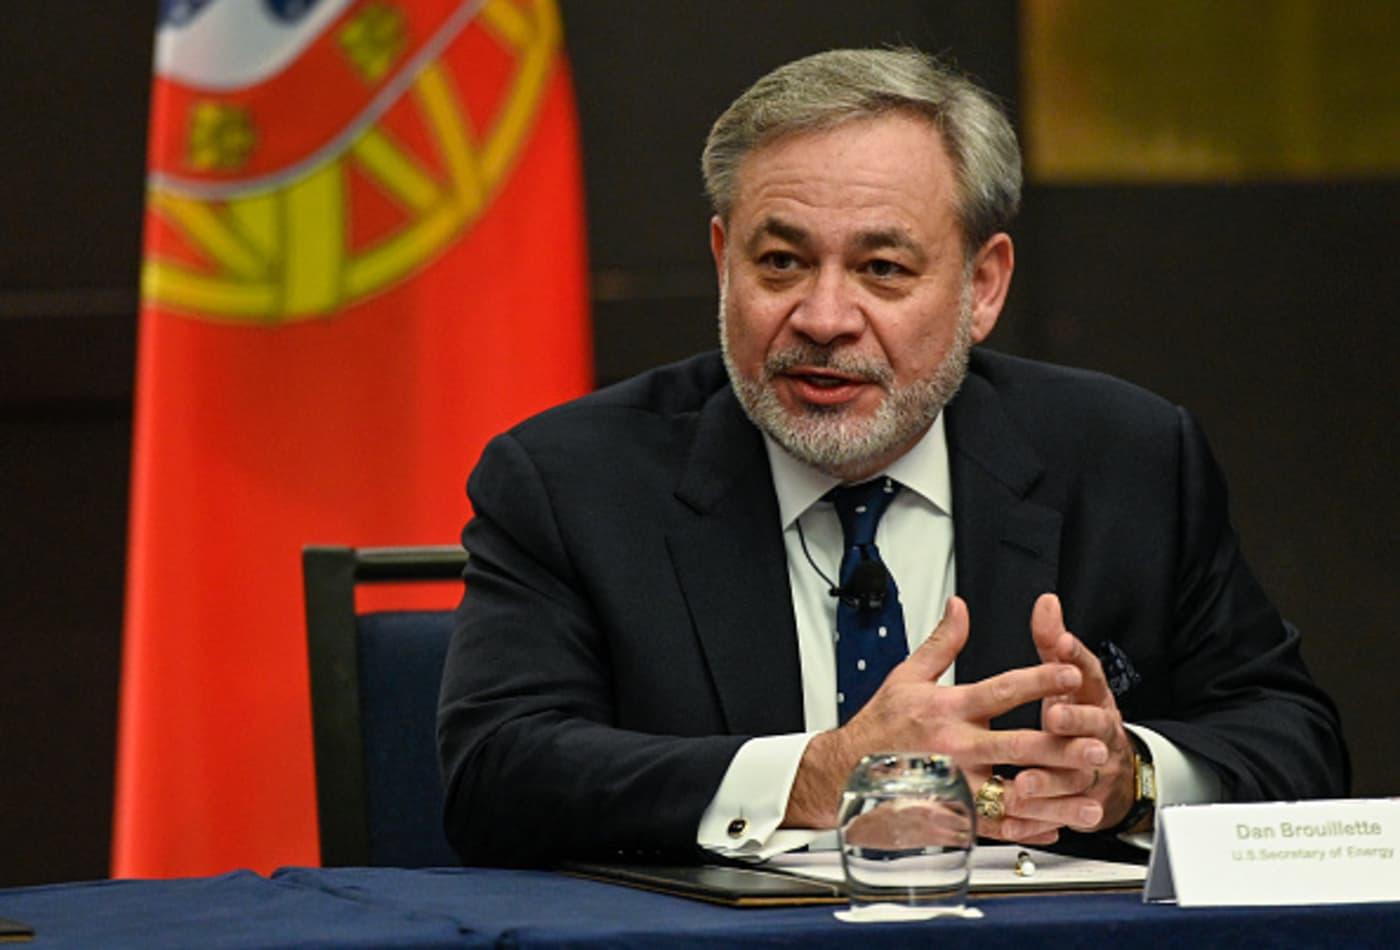 No need to panic about coronavirus impact on oil markets, US energy secretary says